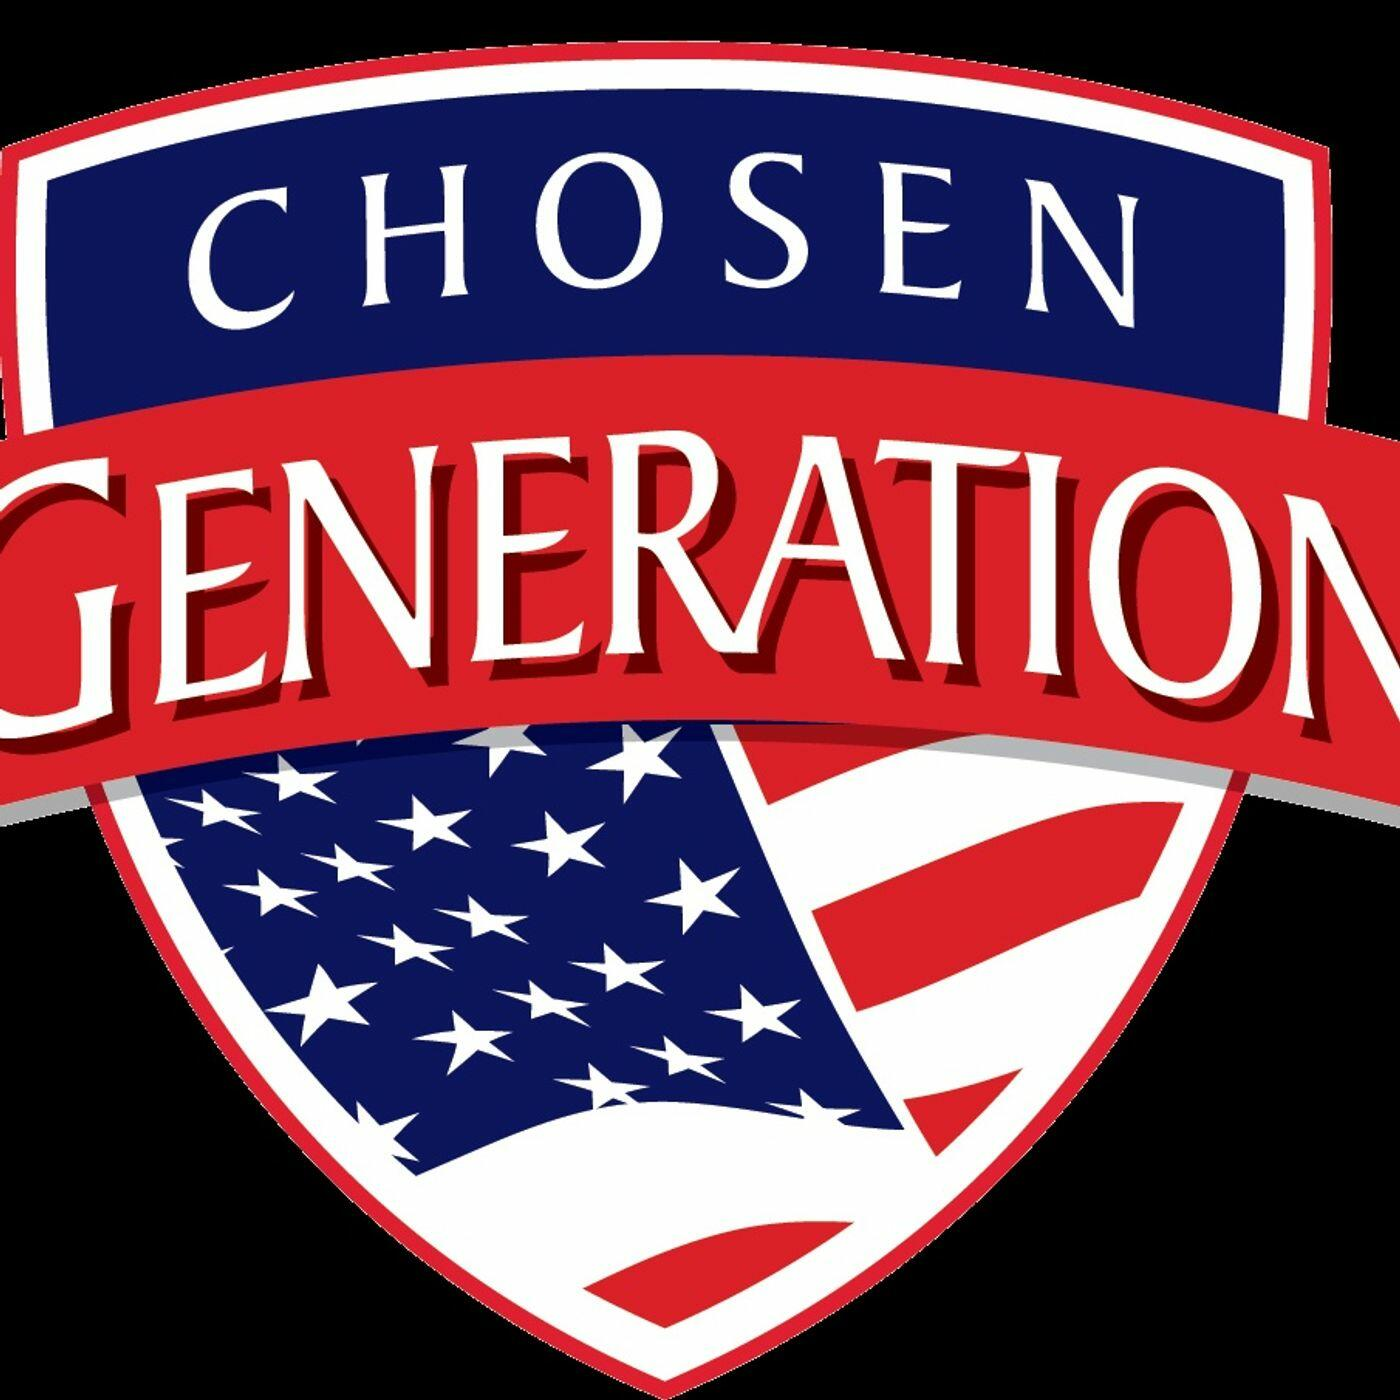 Chosen Generation Most Recent shows